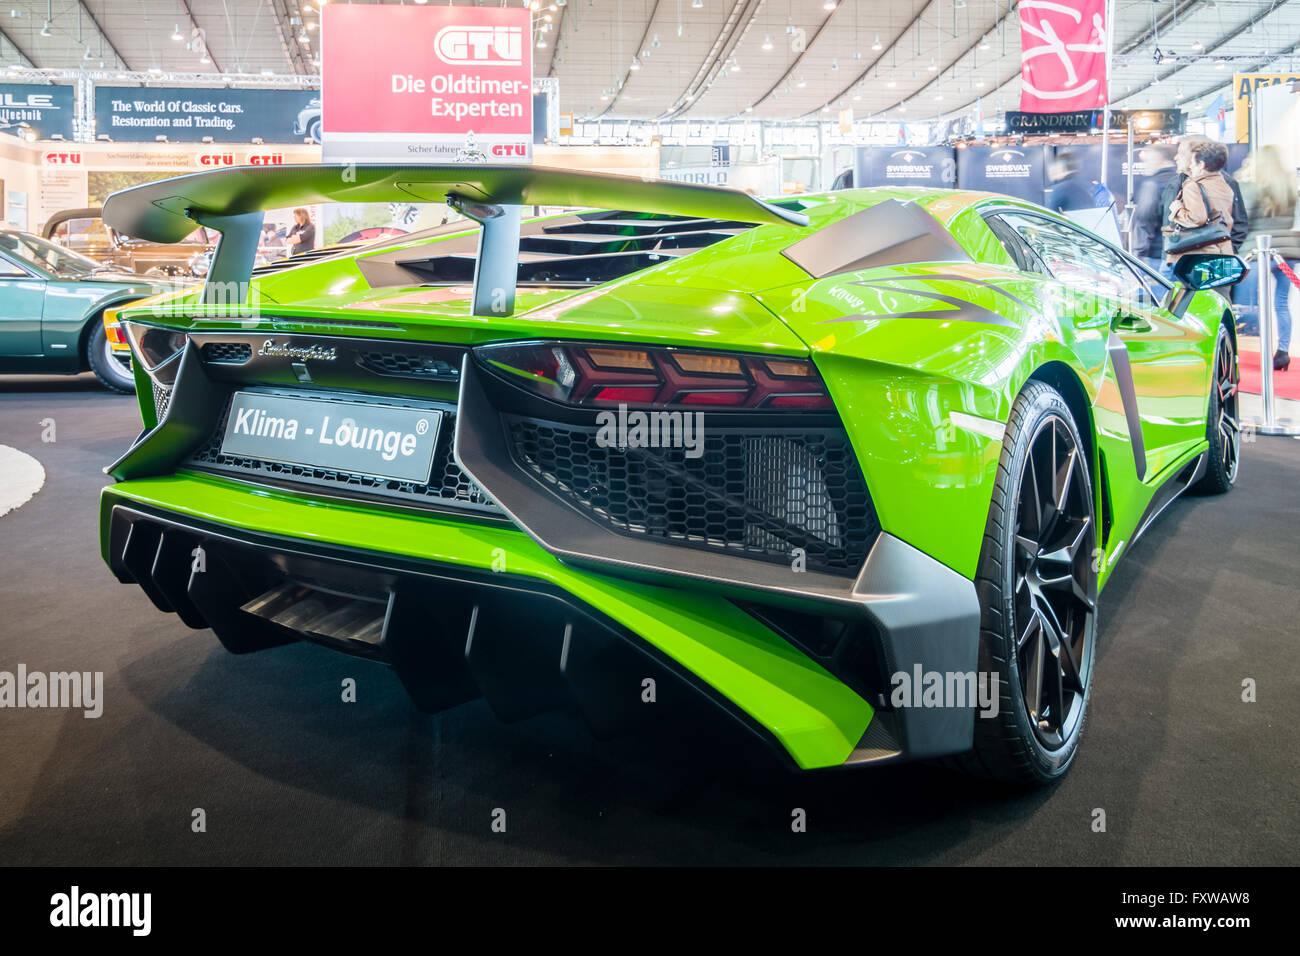 Mid-engined sports car Lamborghini Aventador LP 750-4 SuperVeloce, 2016. - Stock Image